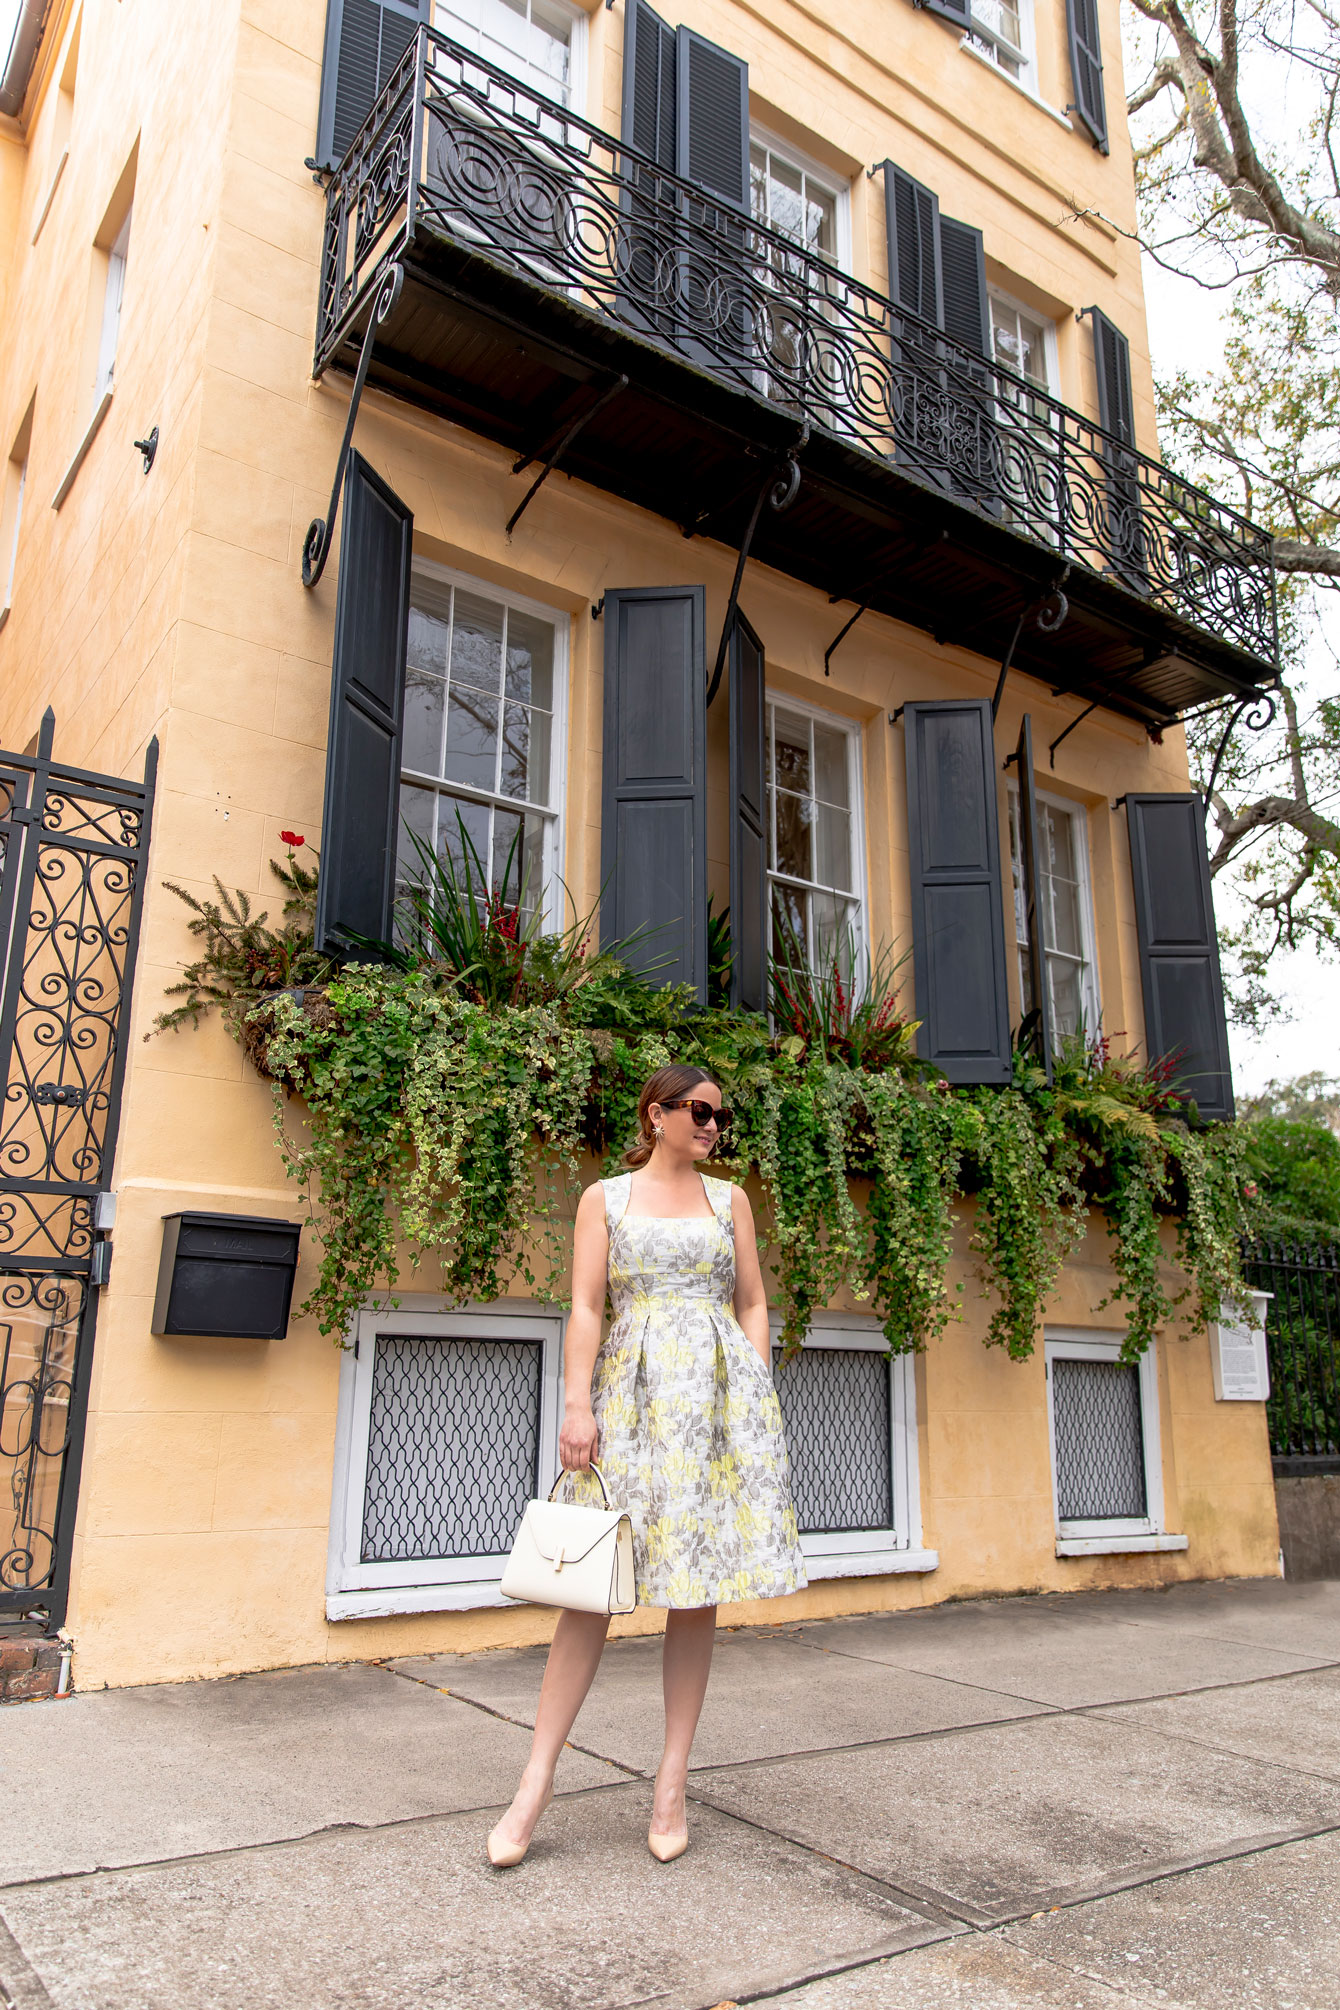 Charleston Colorful Homes